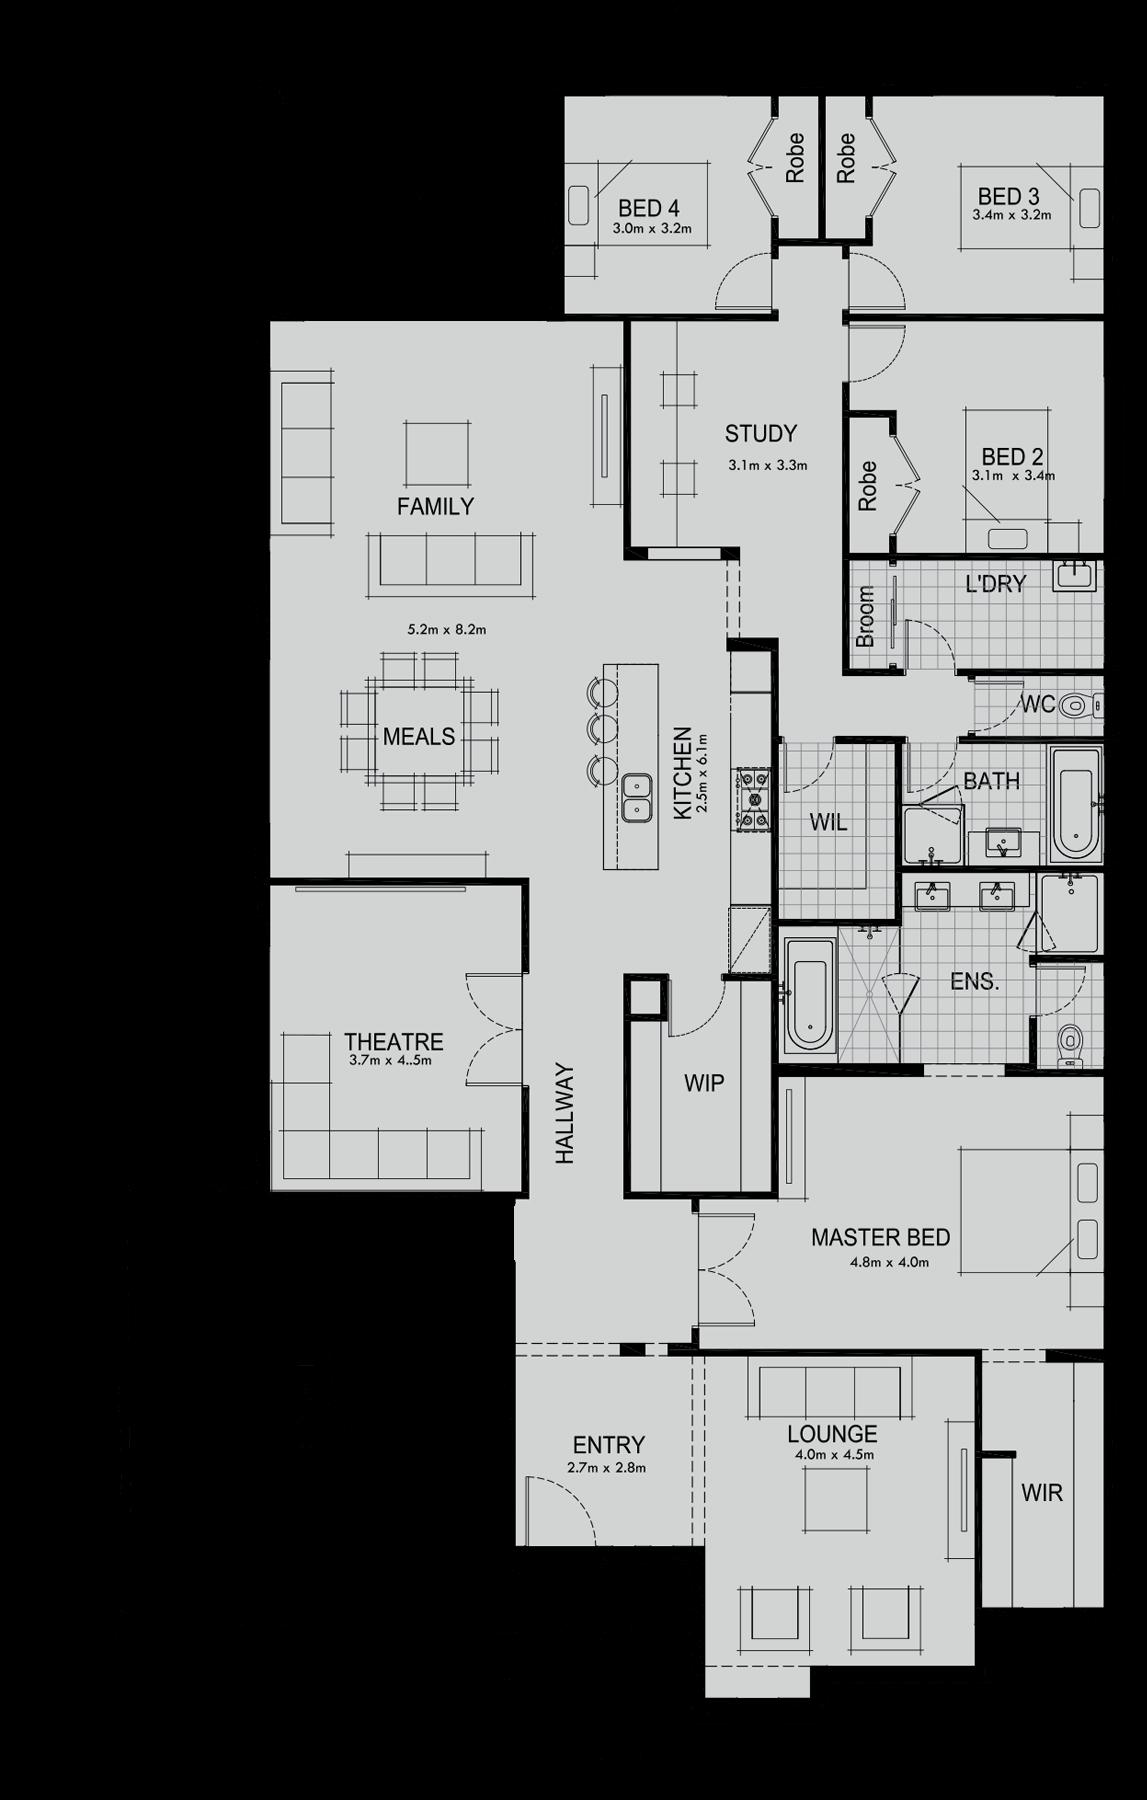 Home Cinema Saba Design 08 Part - 41: Saba 331 | New Homes Melbourne | New Home Designs